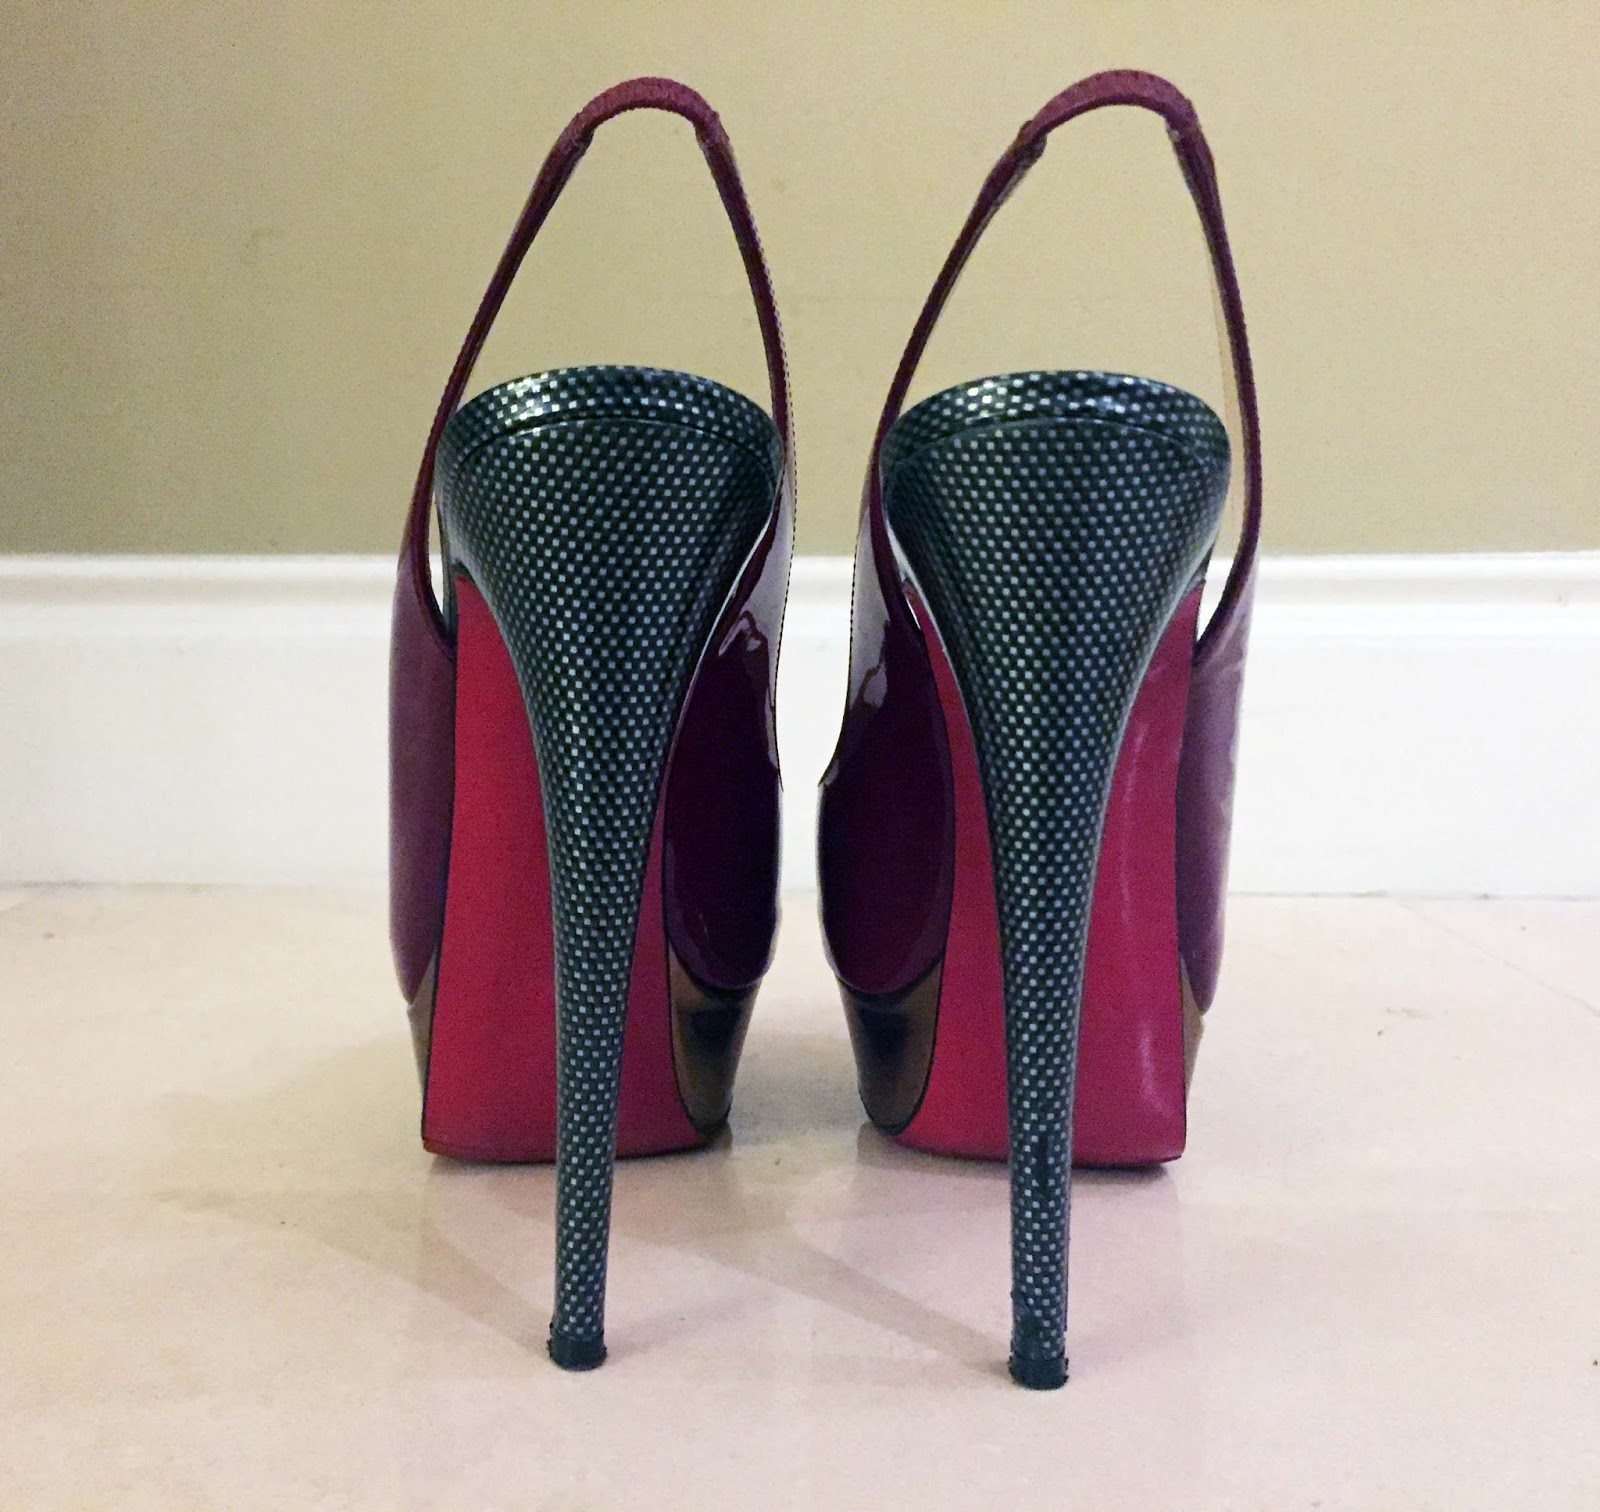 3b57ba1c9ef0 ... replica mens louis vuitton shoes - My Superficial Endeavors  New Shoes  and Belt ...